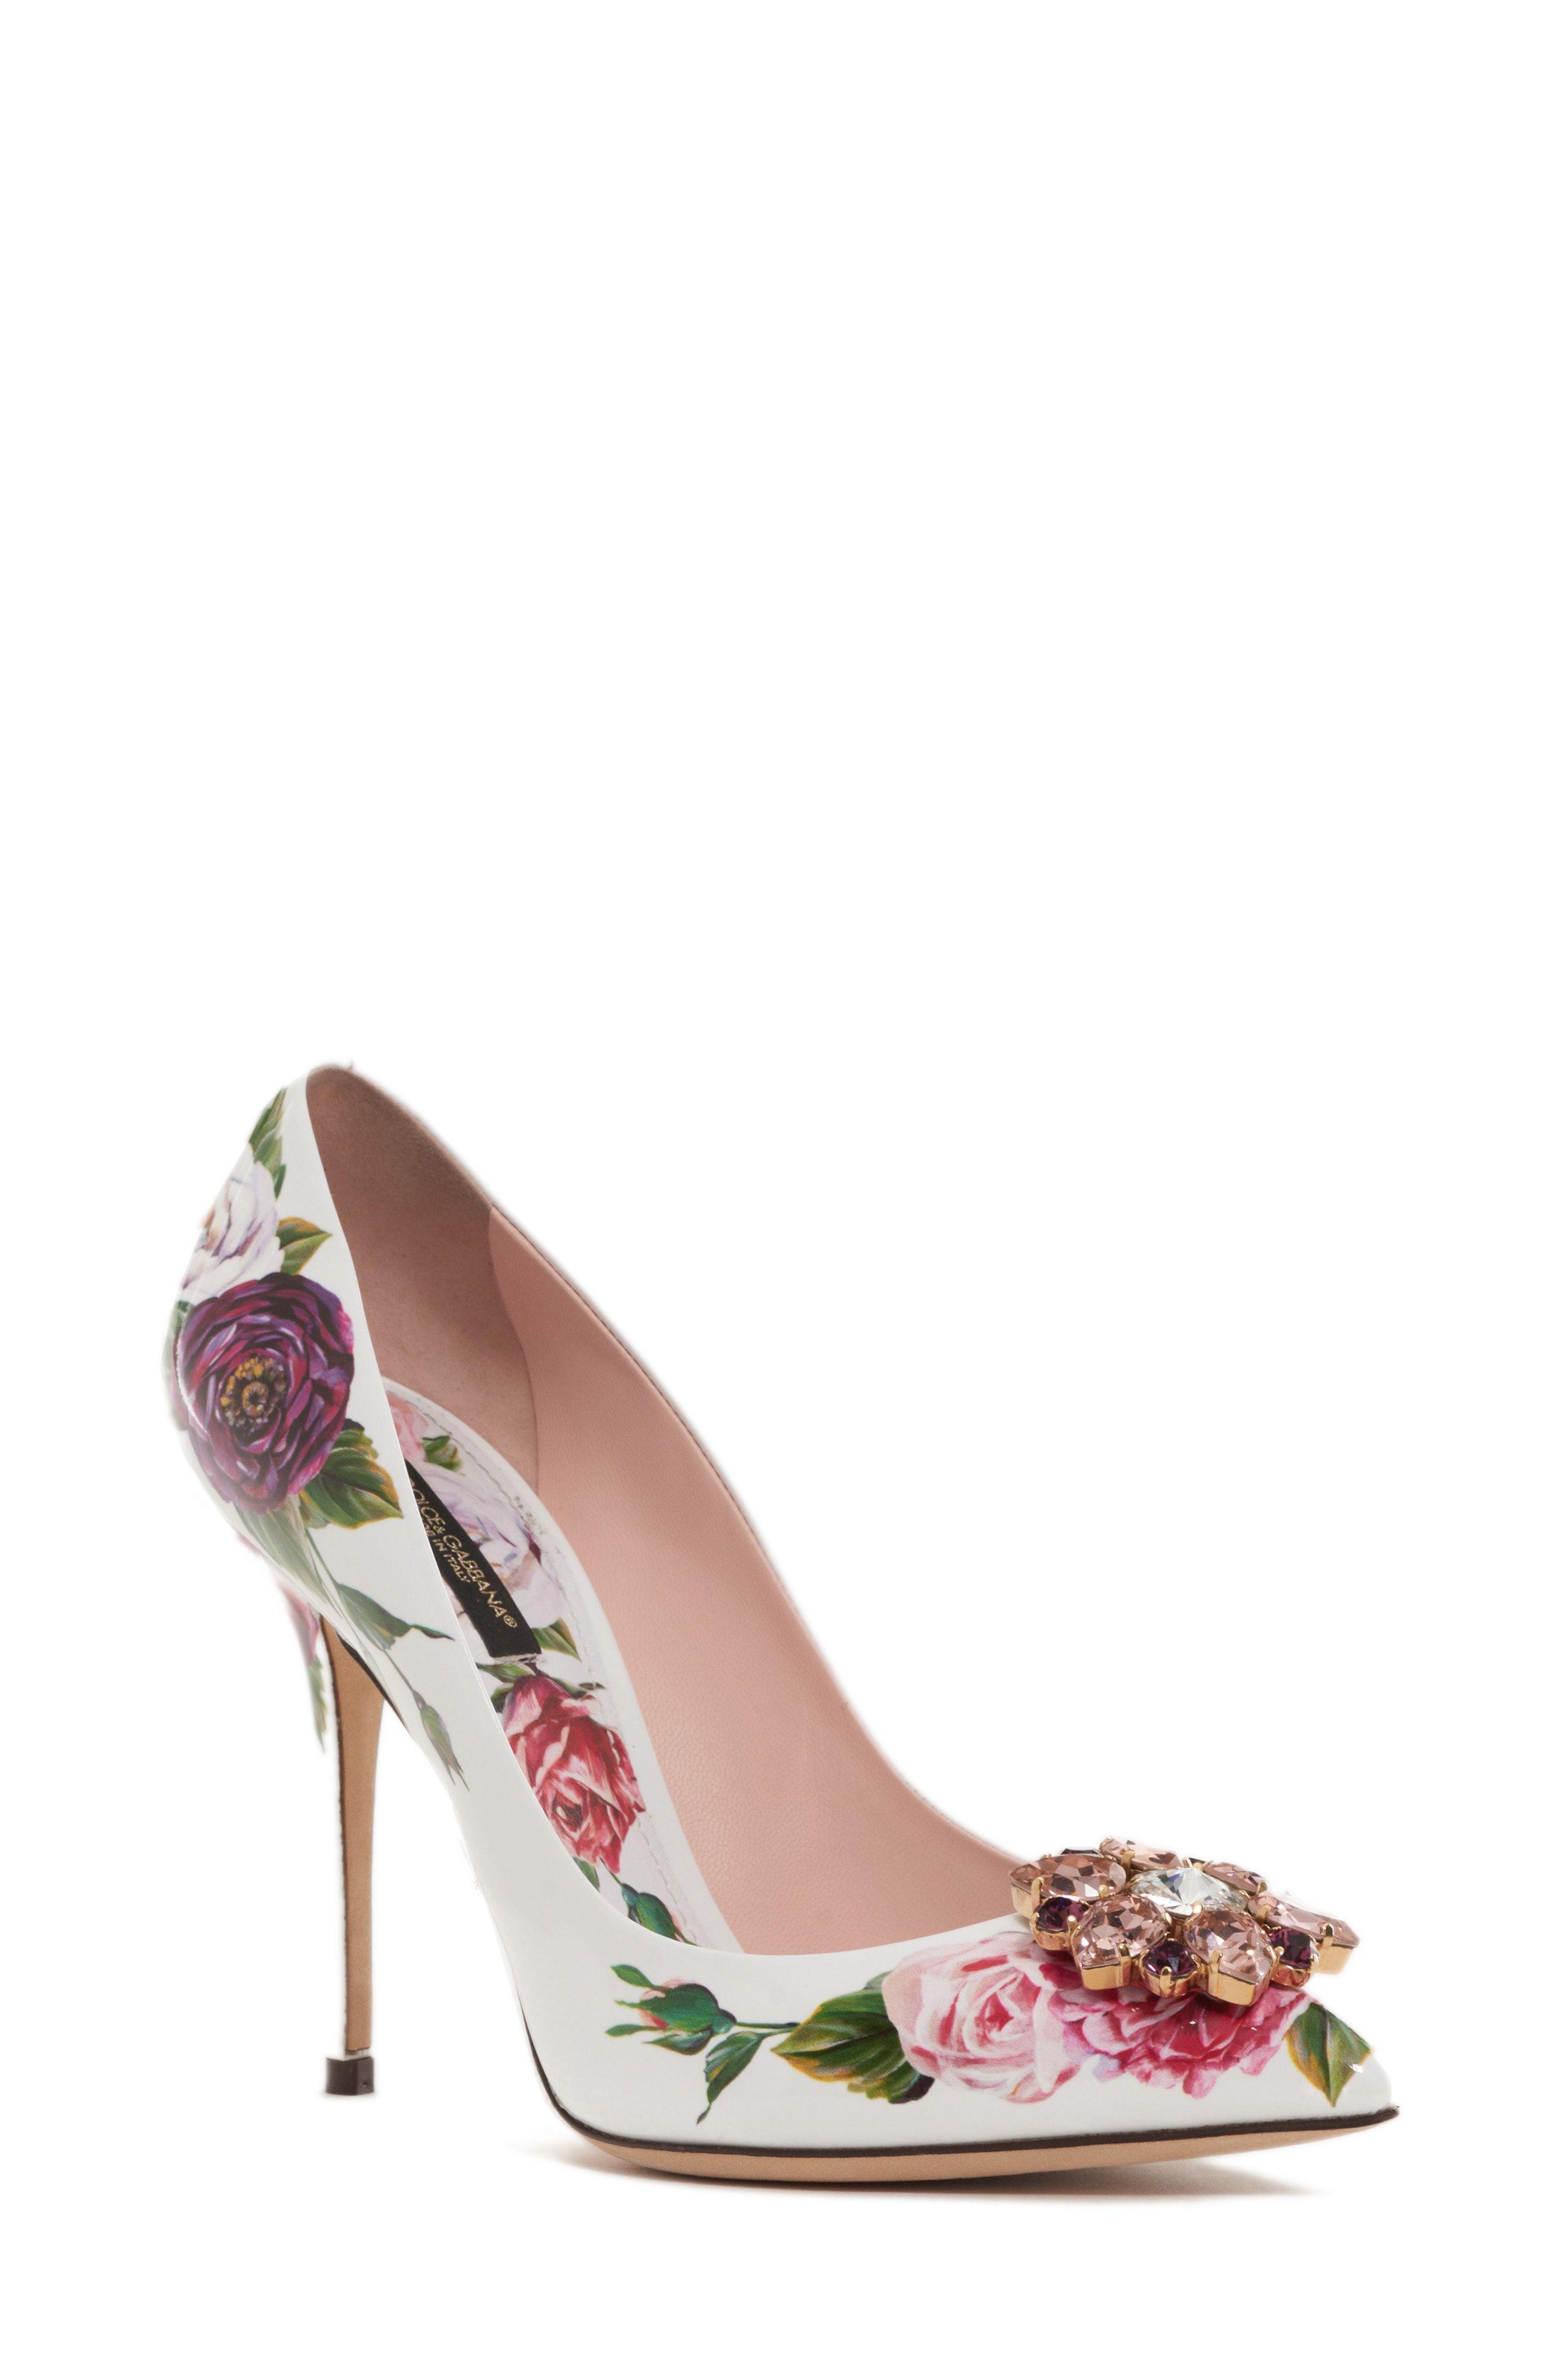 Dolce & Gabbana Bellucci Decollete 'Con Peonia Print En